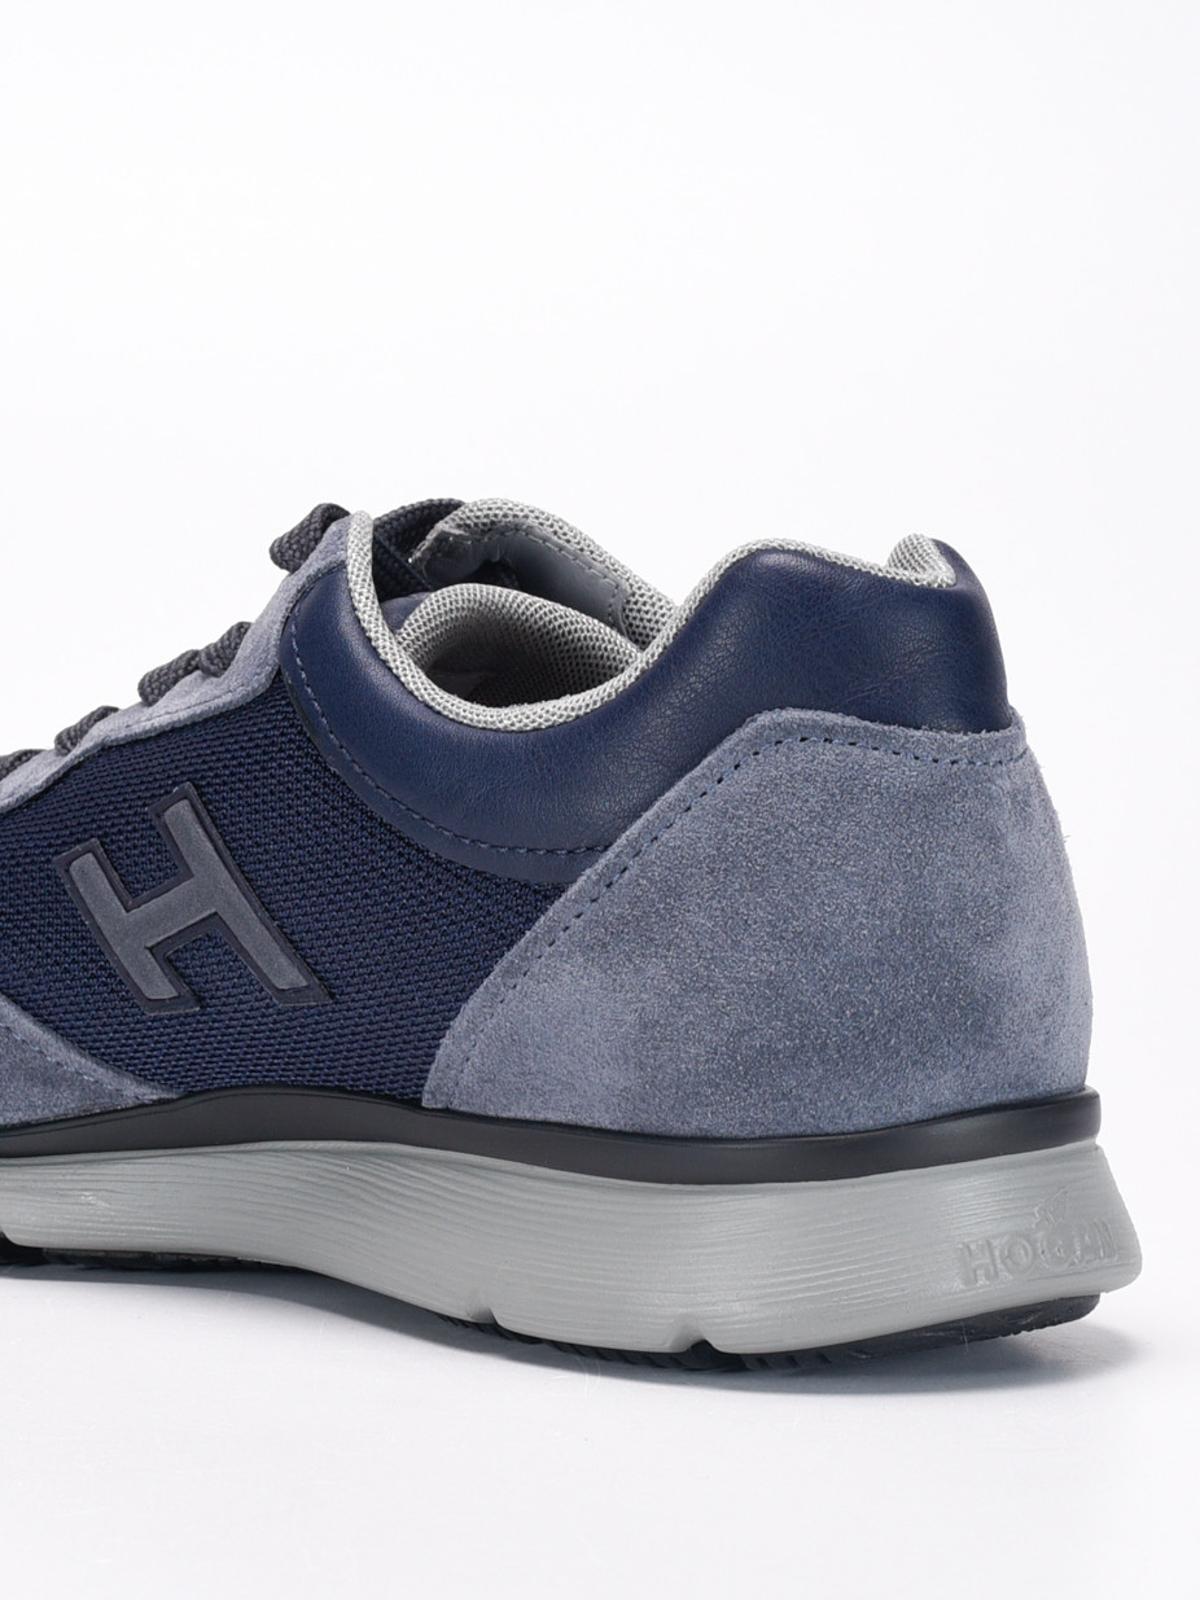 Hogan H254 H Flock sneakers اسپرت،اسنیکرز